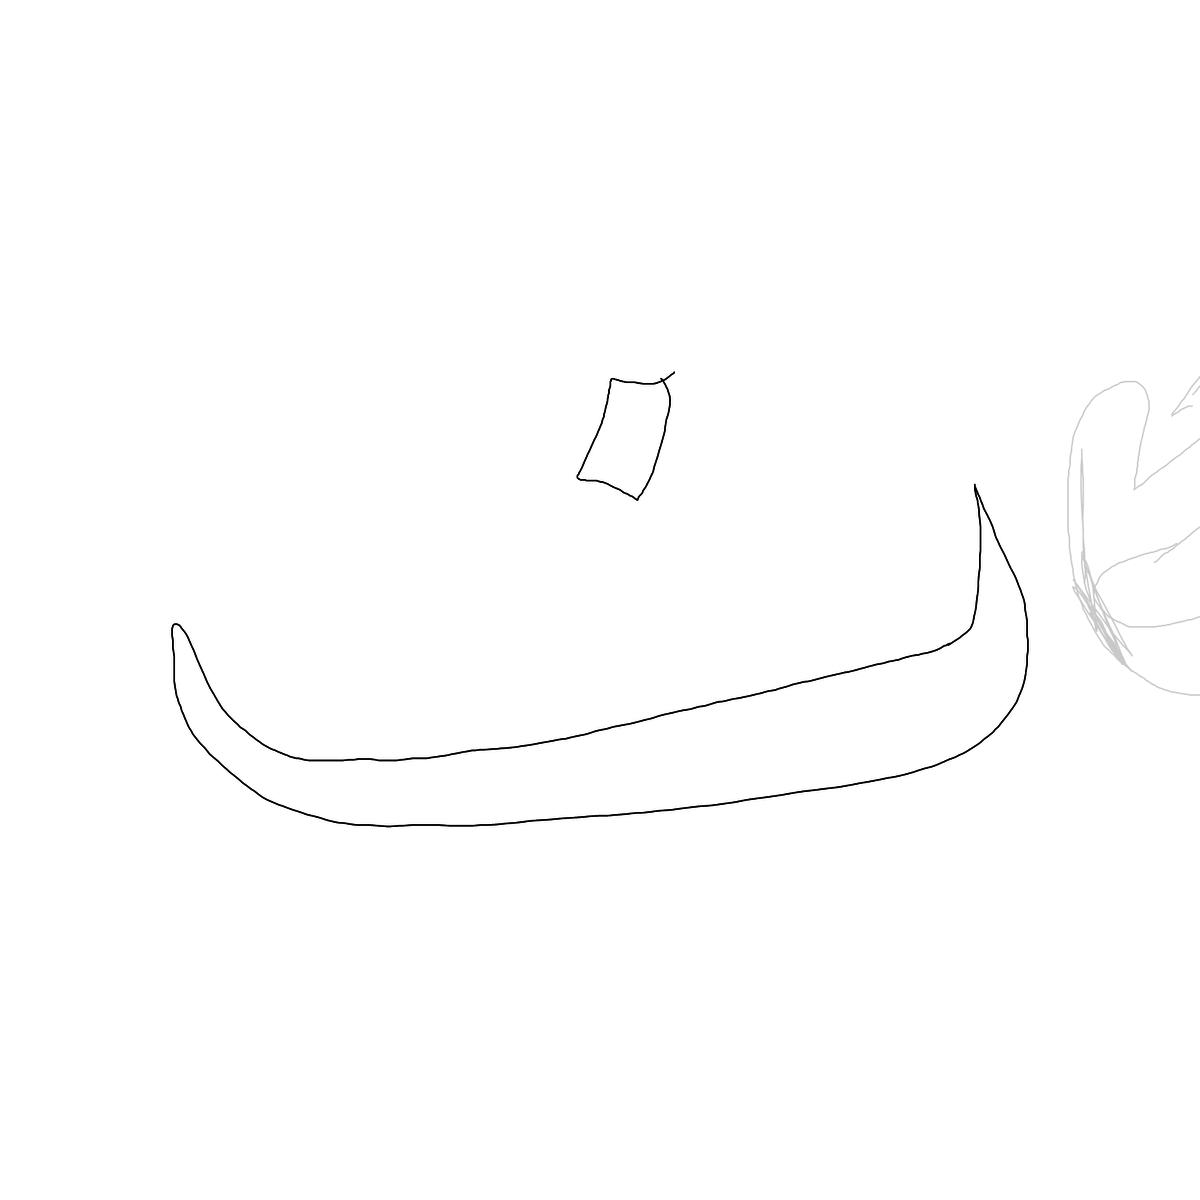 BAAAM drawing#23148 lat:30.6669254302978500lng: 48.6744384765625000